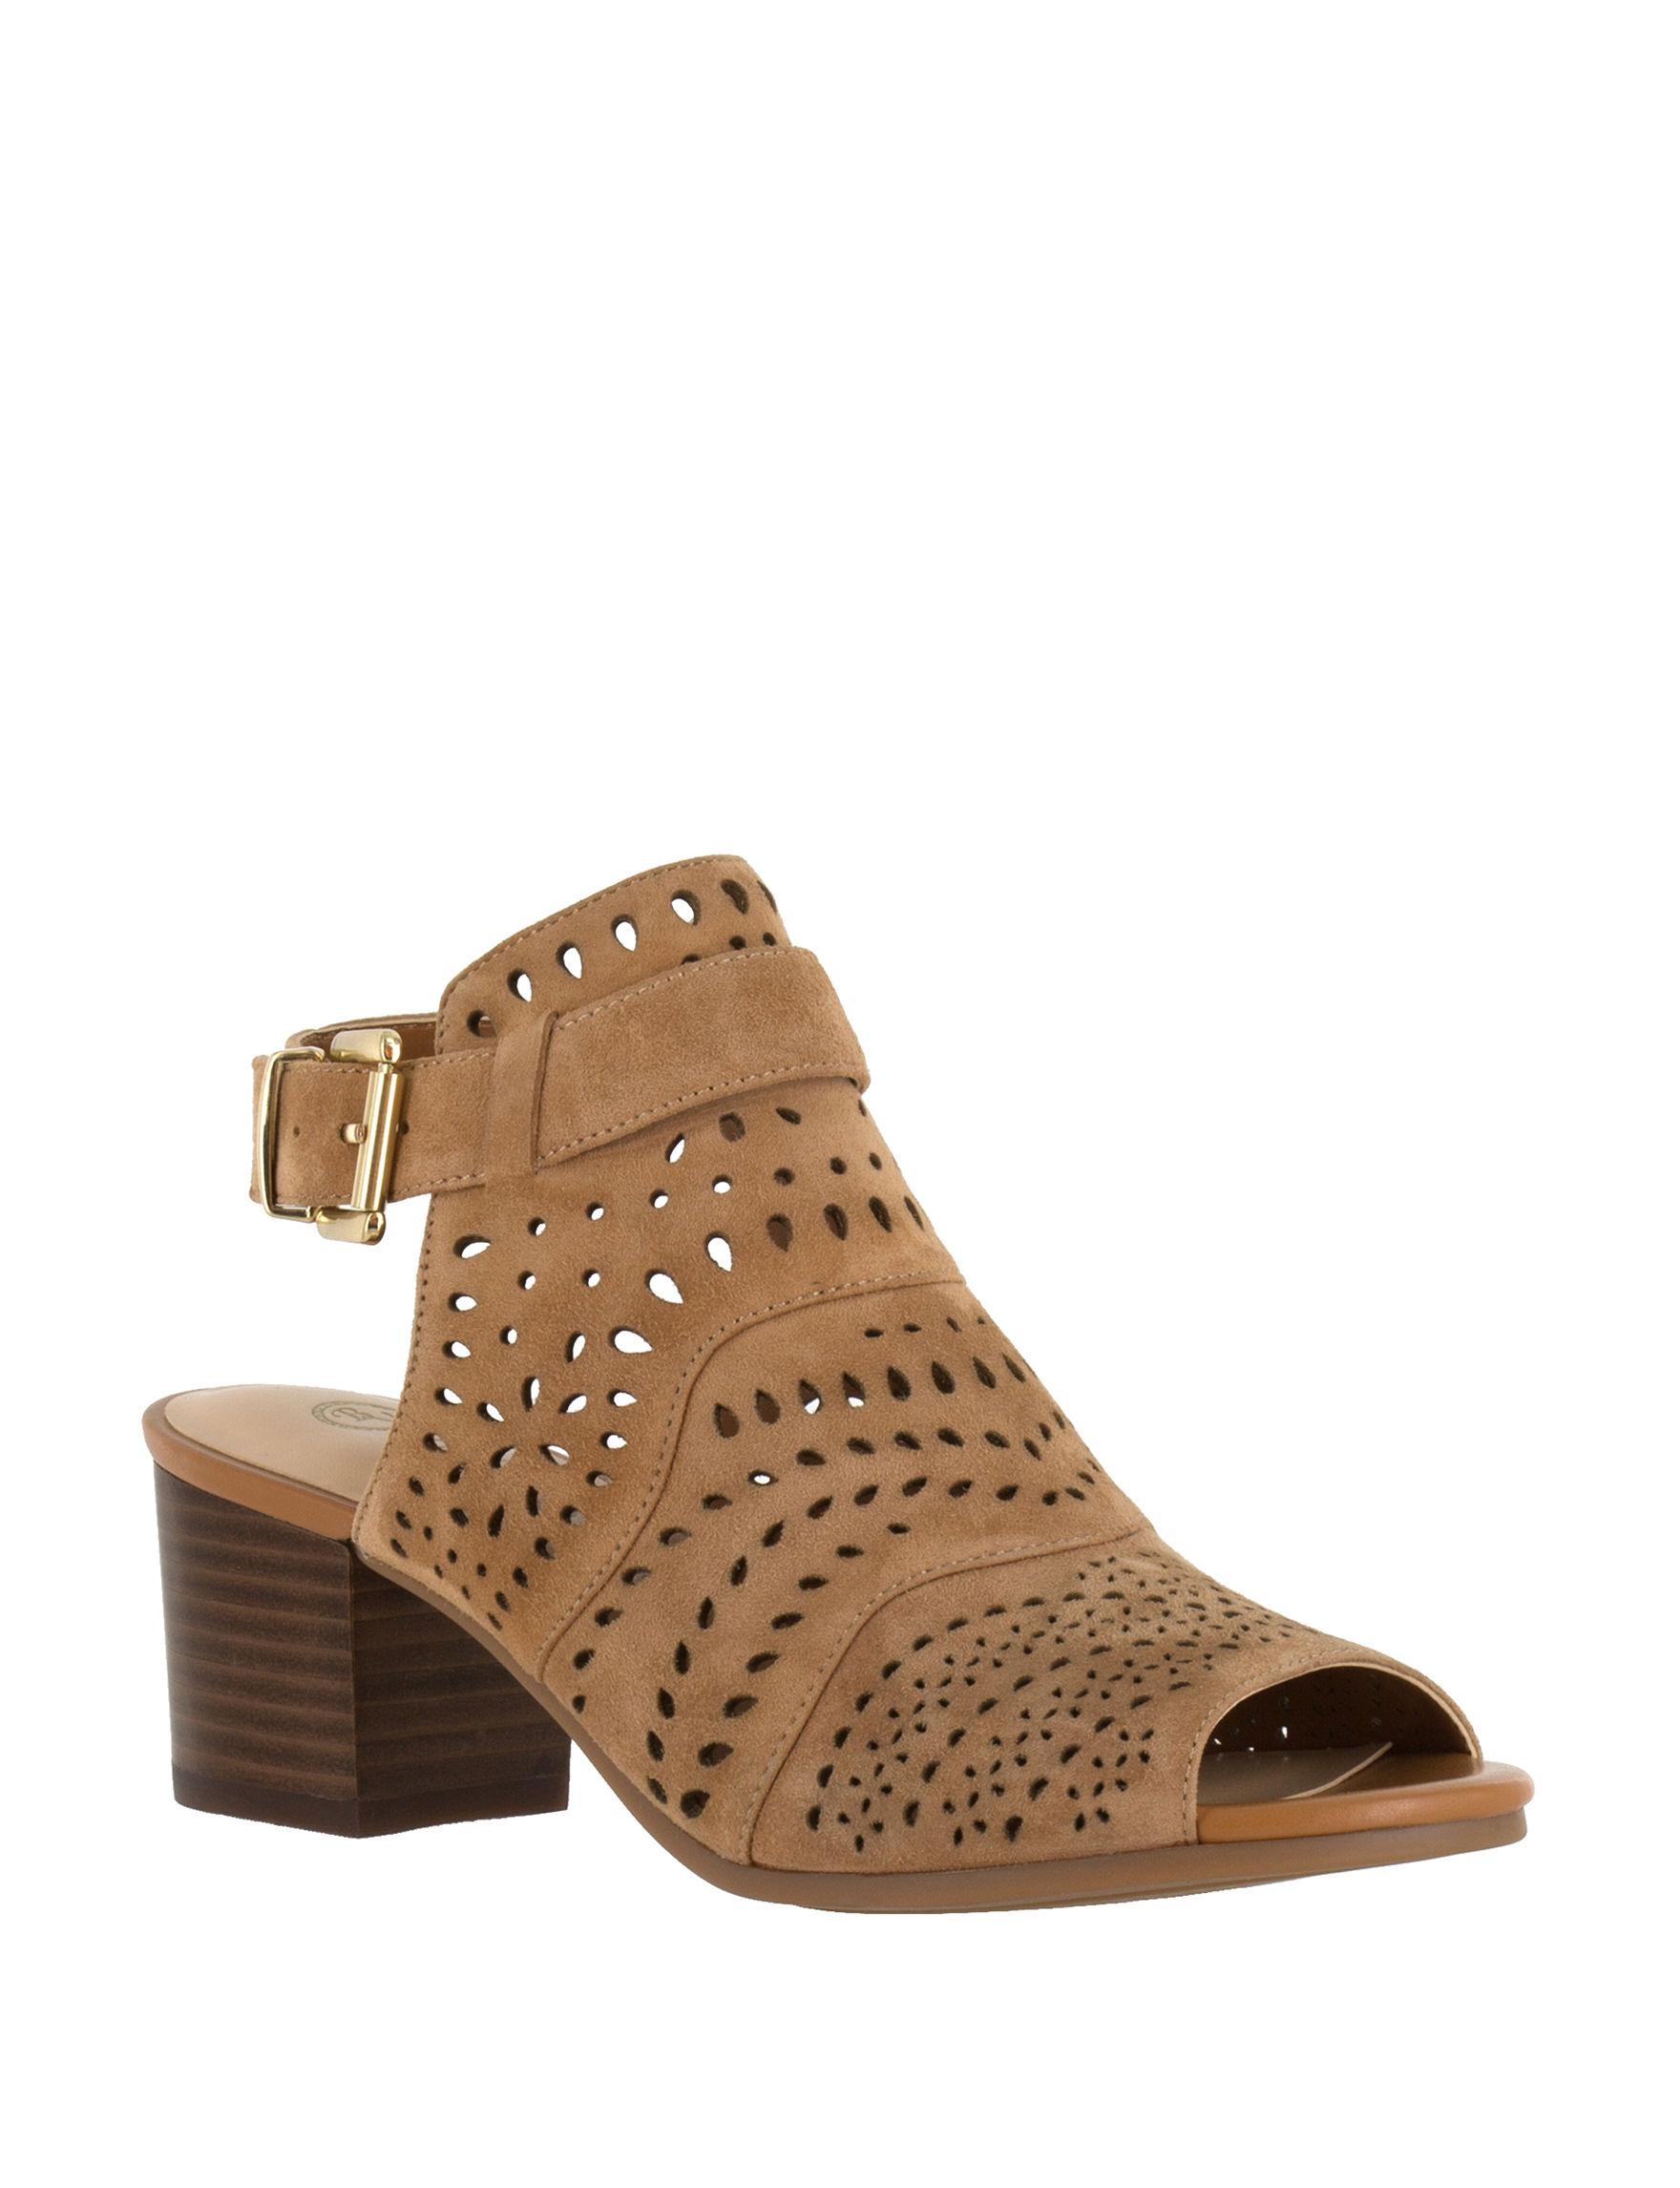 Bella Vita Natural Heeled Sandals